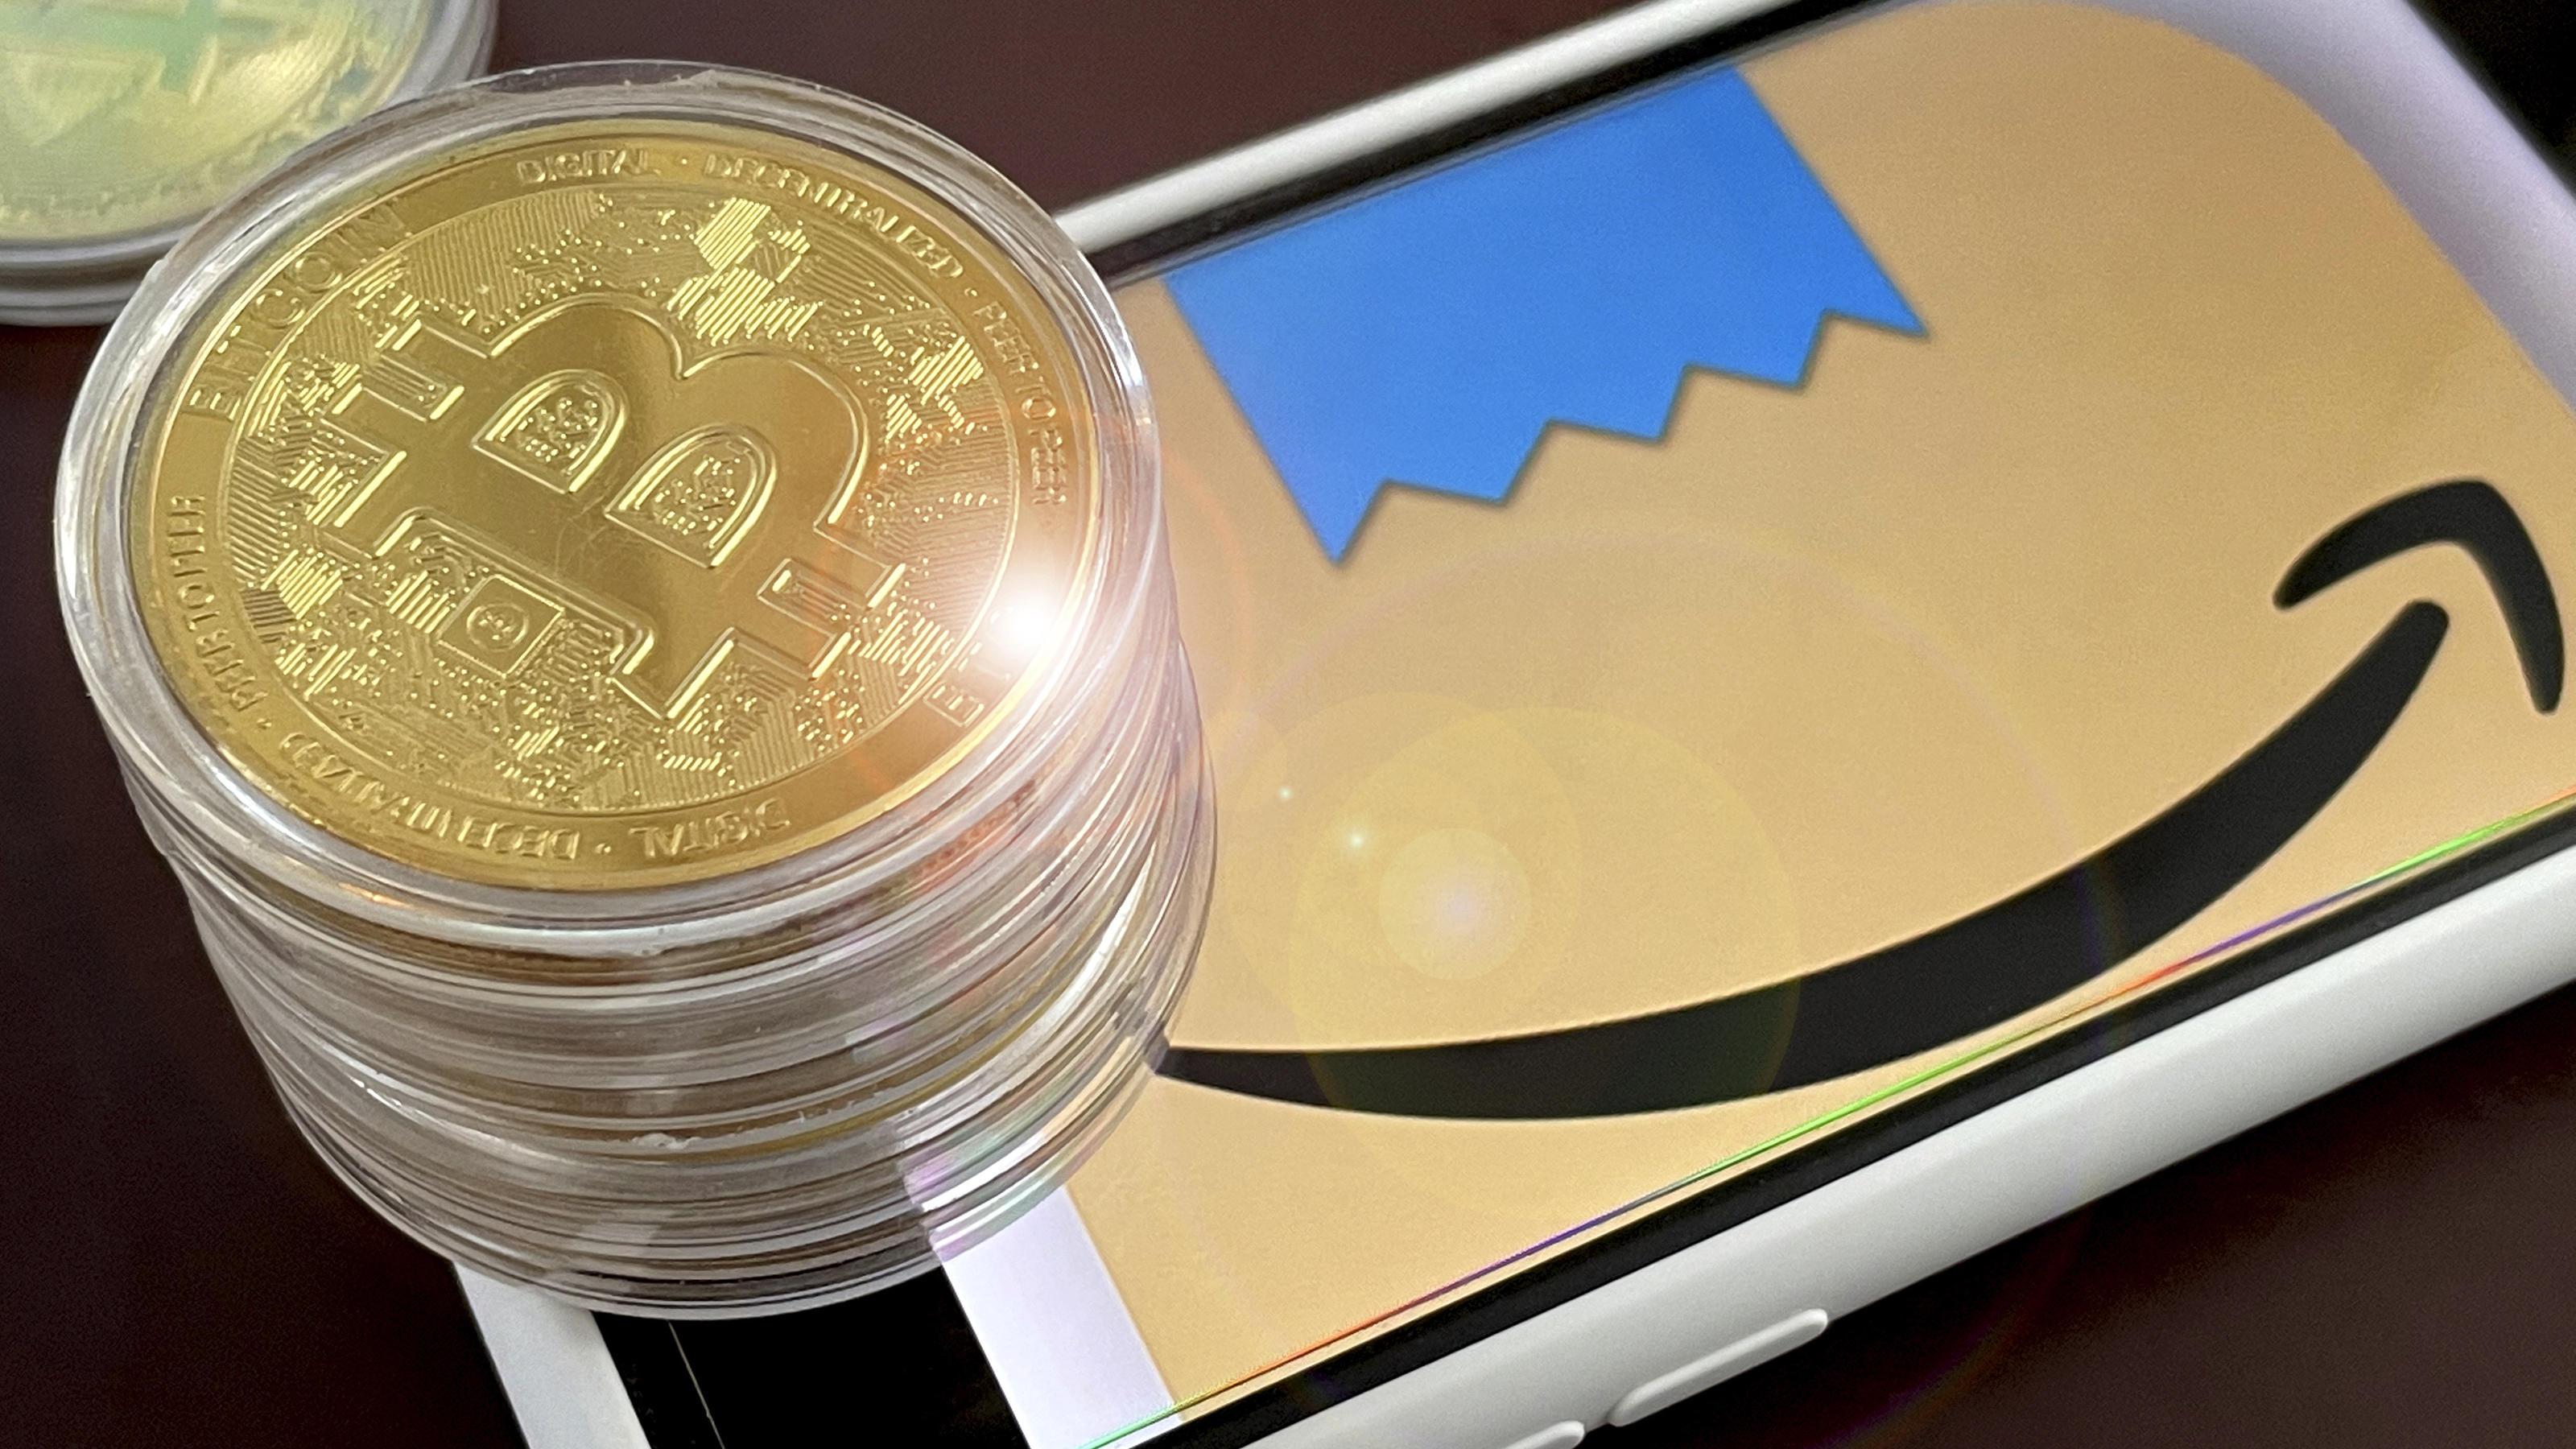 Bitcoin Kurssturz: Gewinnmitnahmen lassen Kryptowährung nahe 30000 US-Dollar stürzen